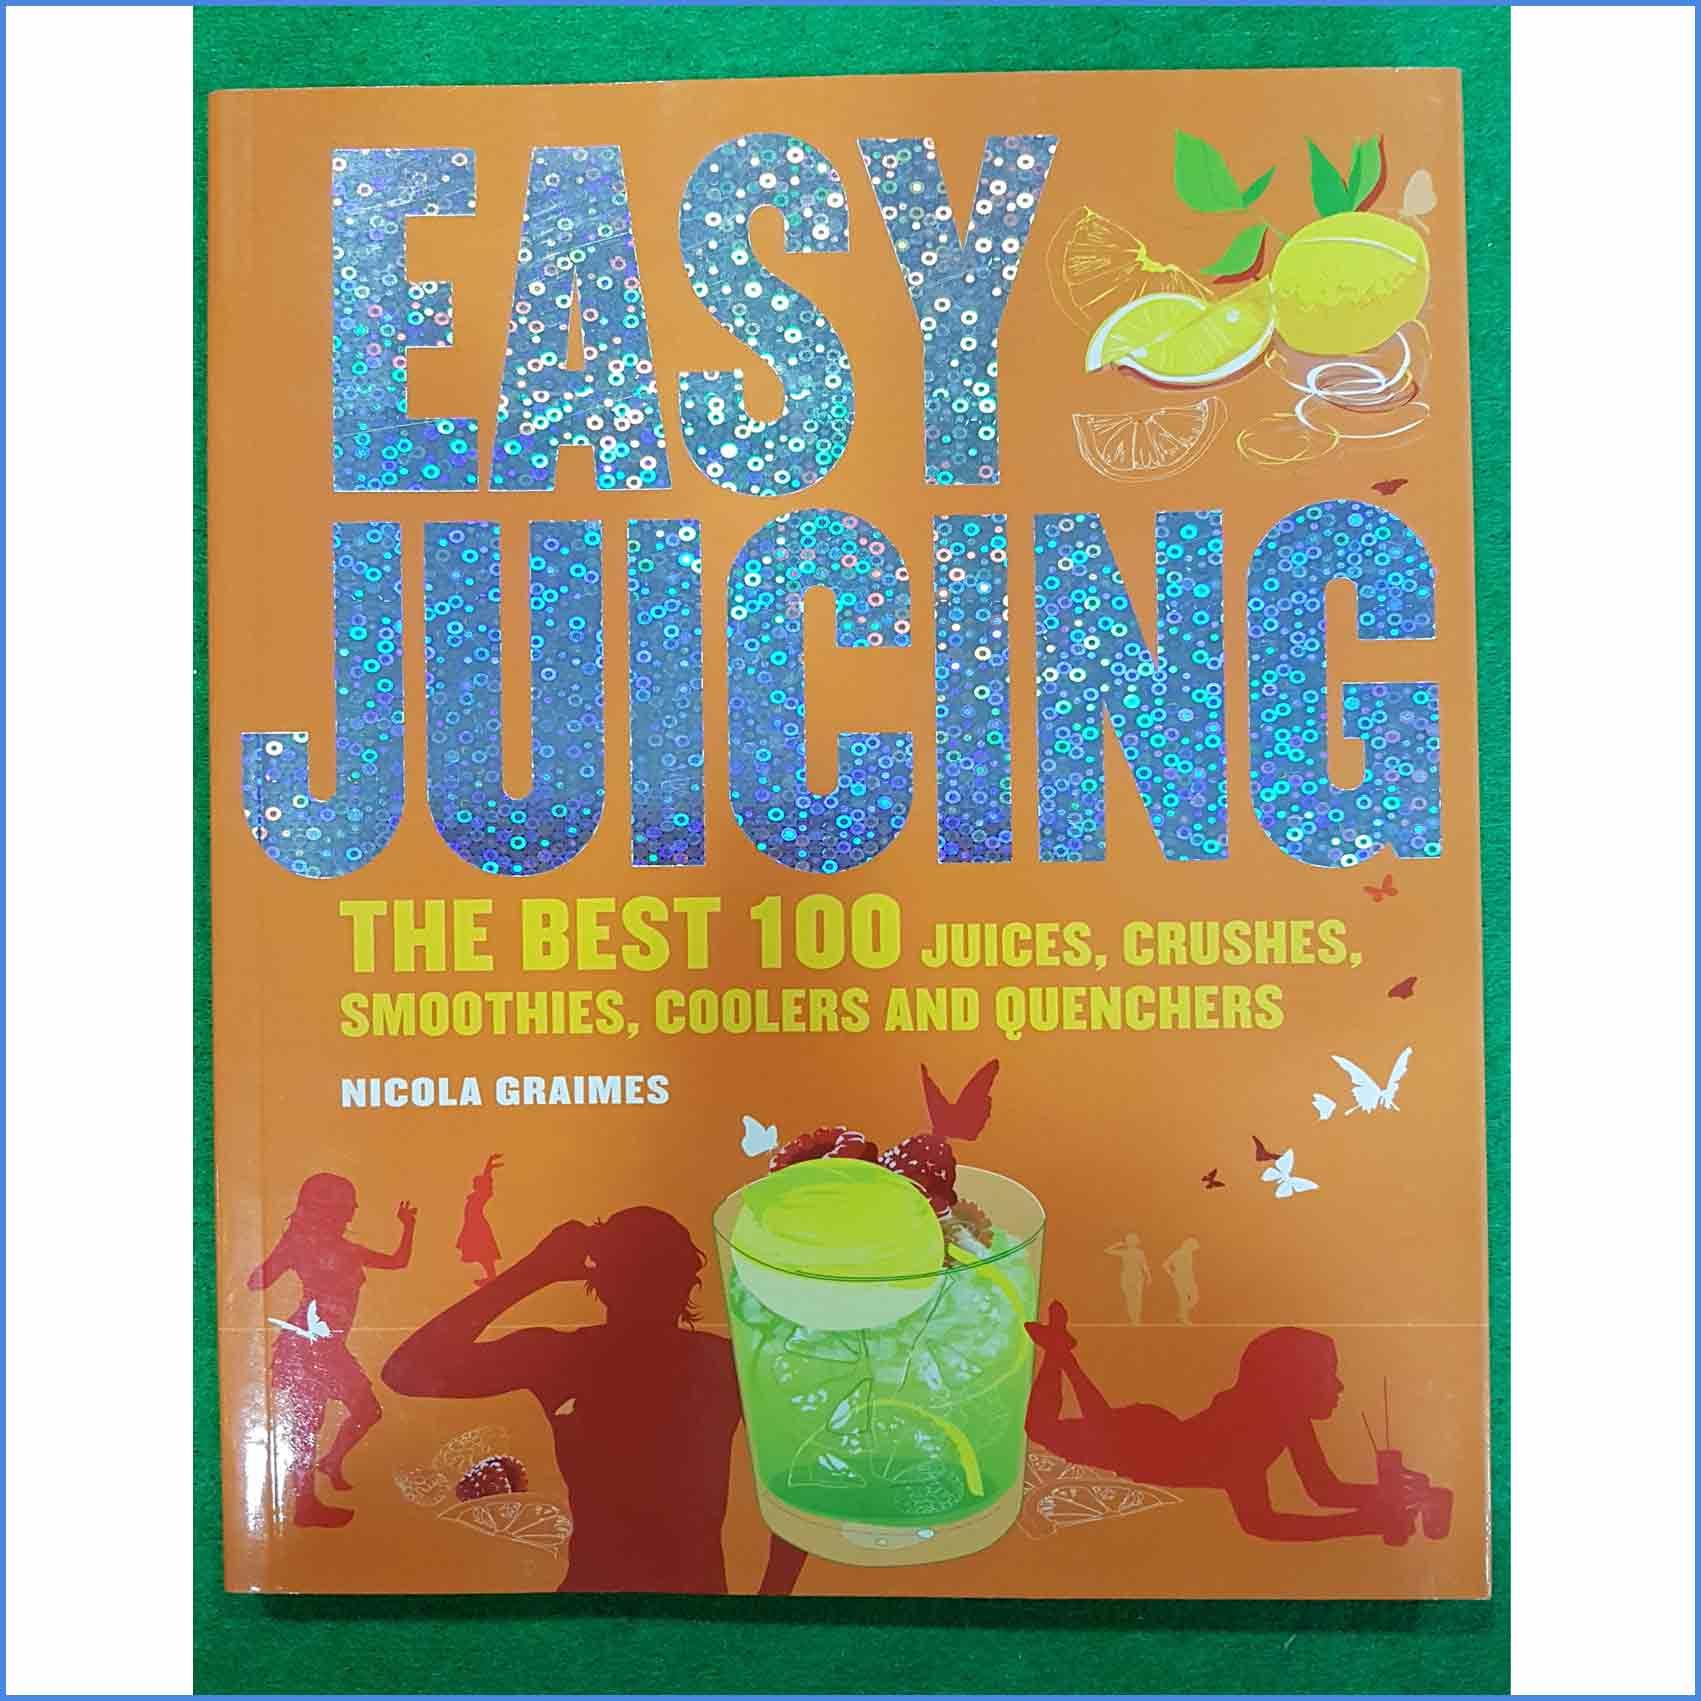 Easy Juicing 100 recipes